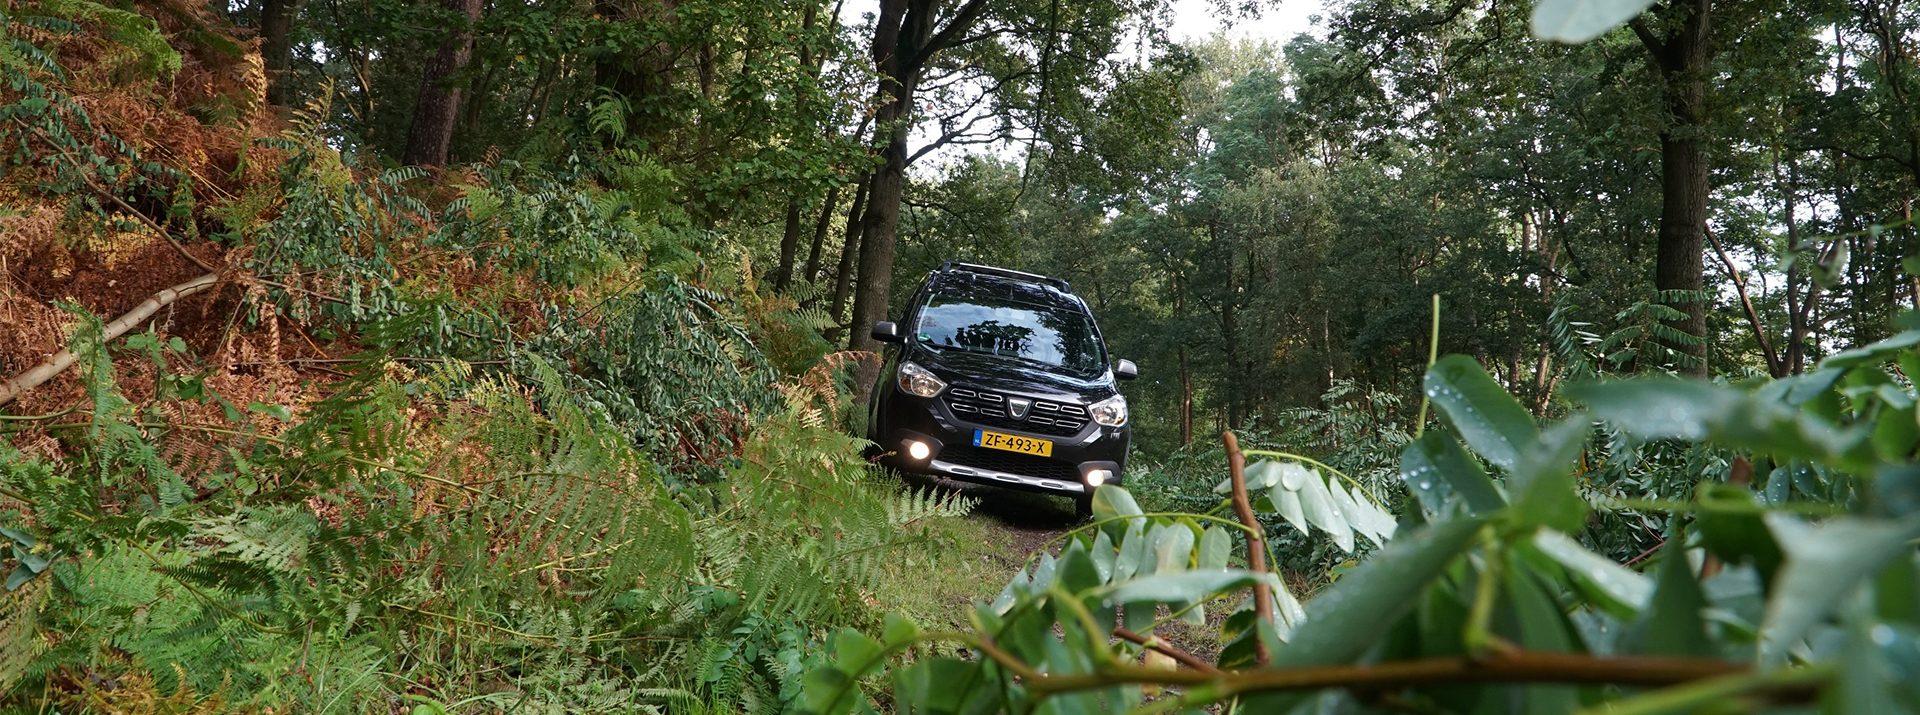 Dacia Dokker off road sfeerfoto